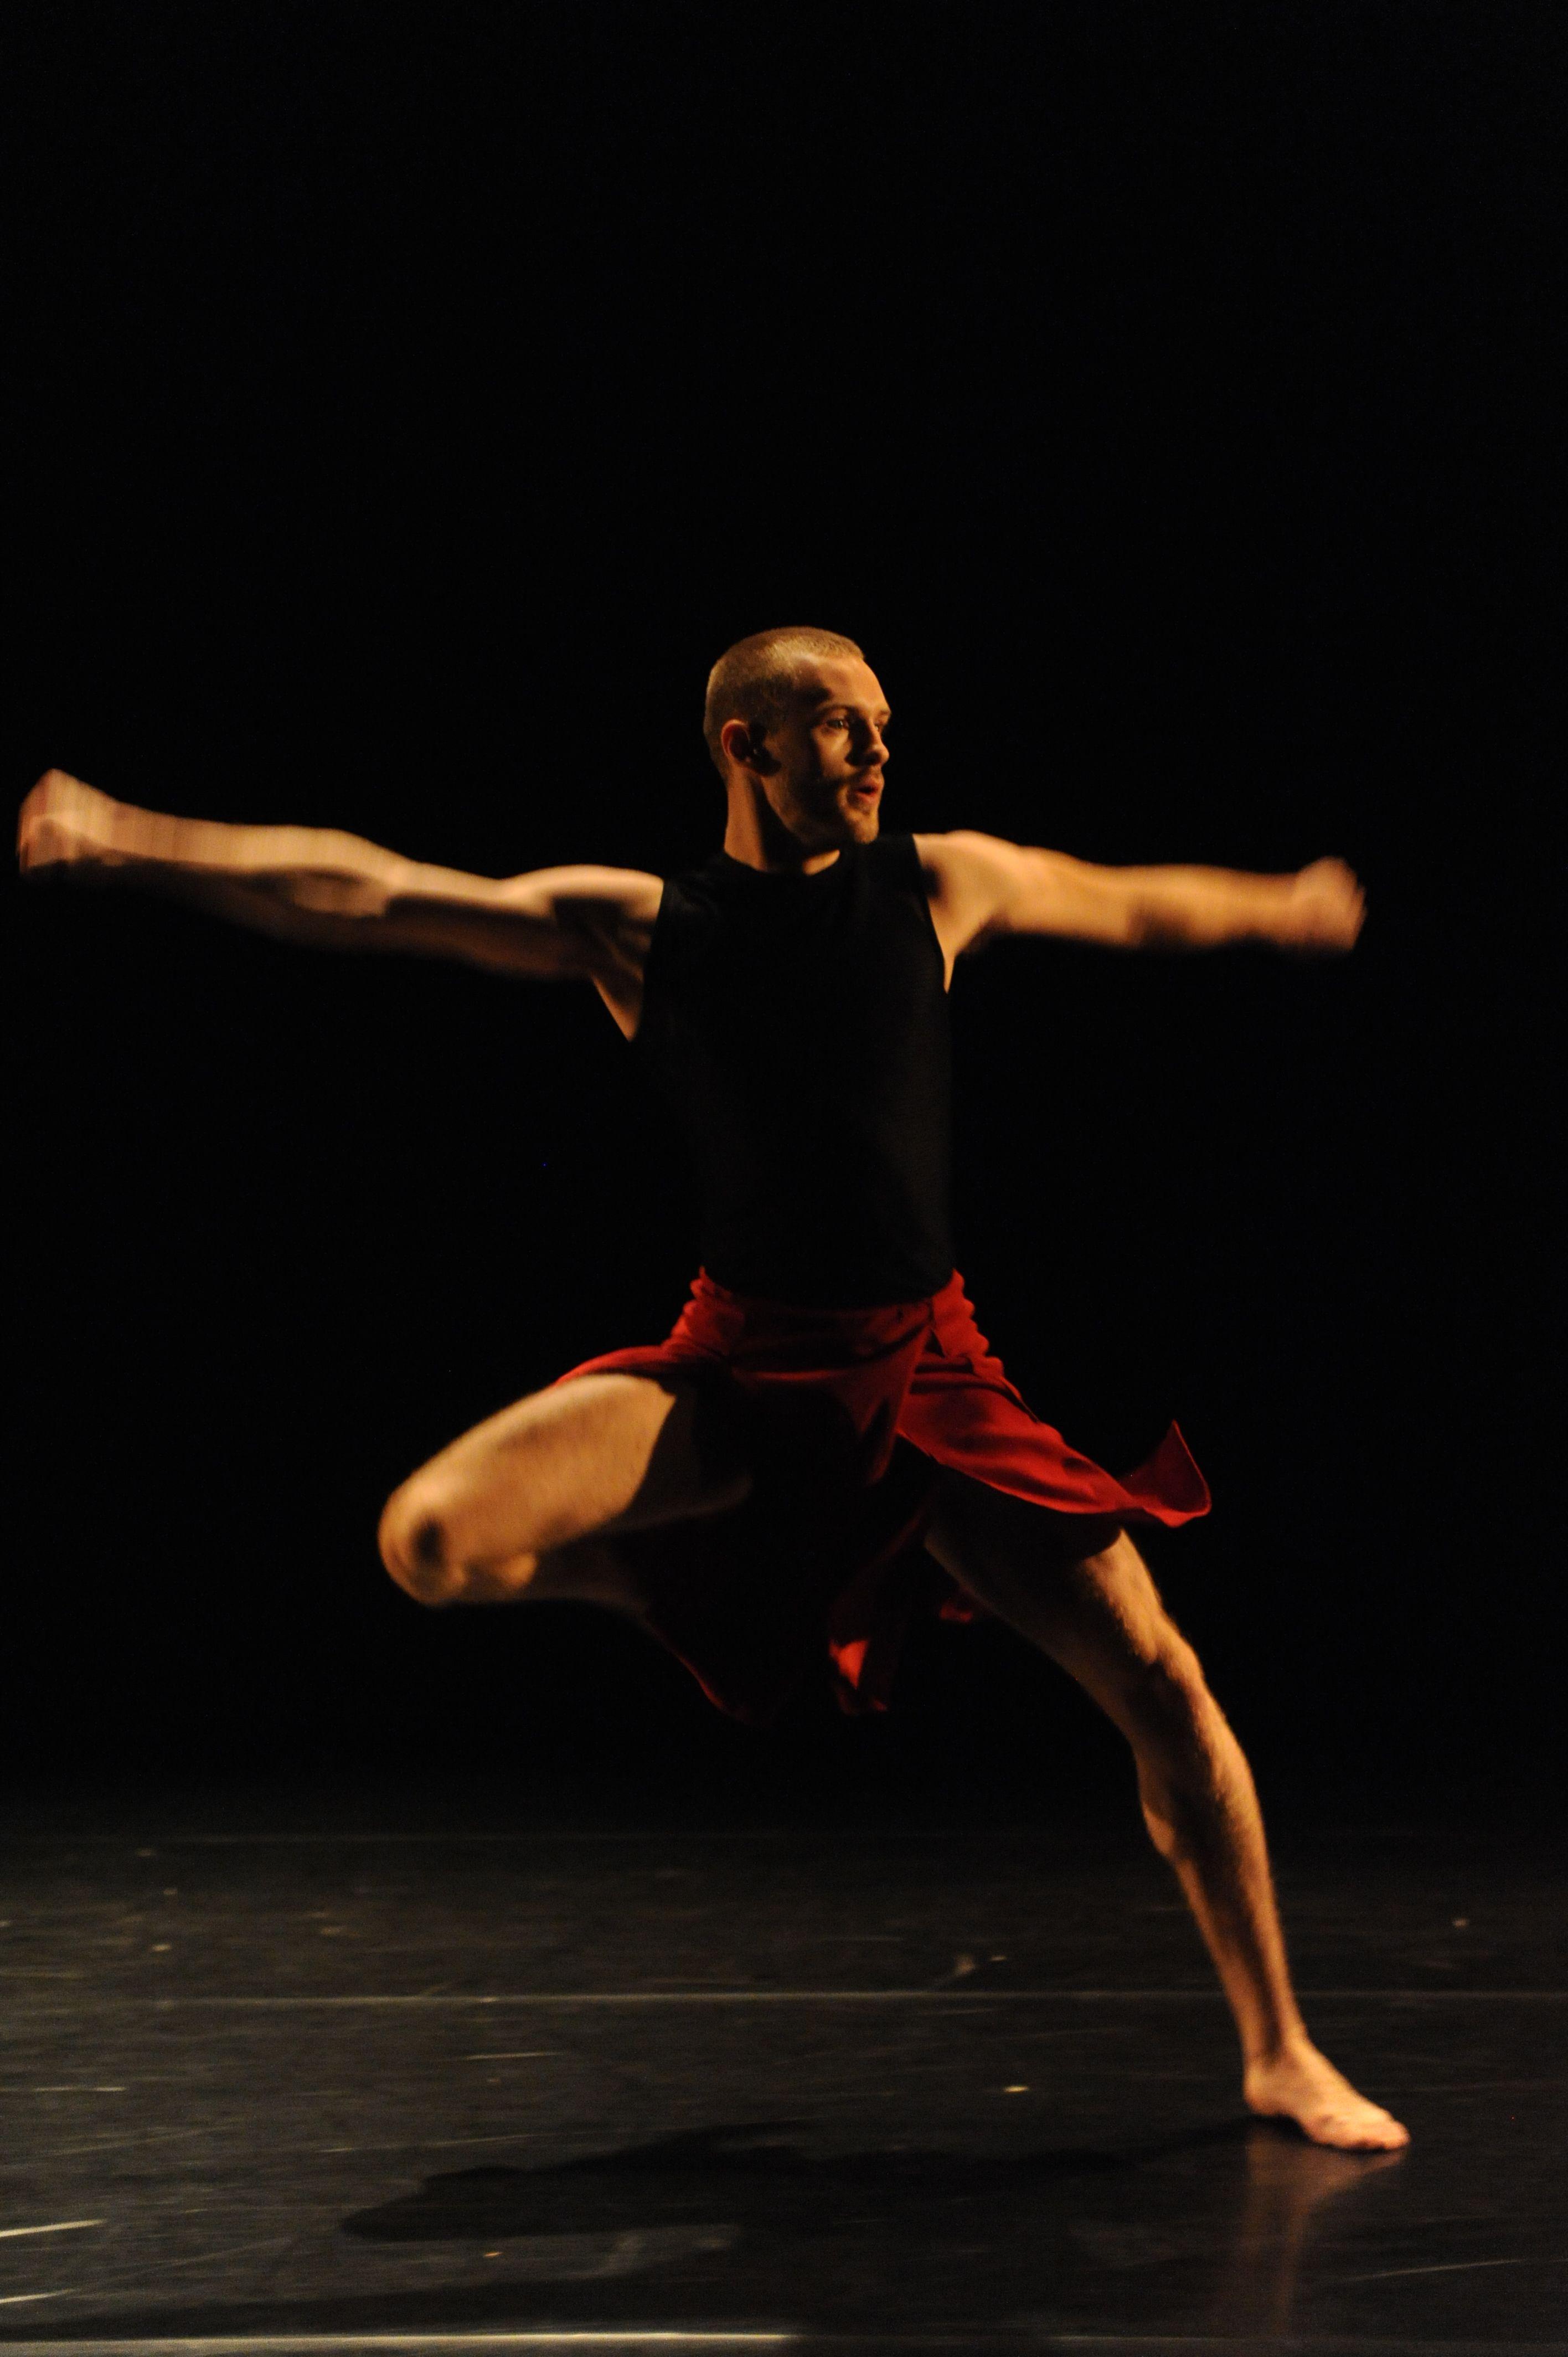 Jarrett Siddall in Vena Cava, Toronto Dance Theatre. Photo by Guntar Kravis